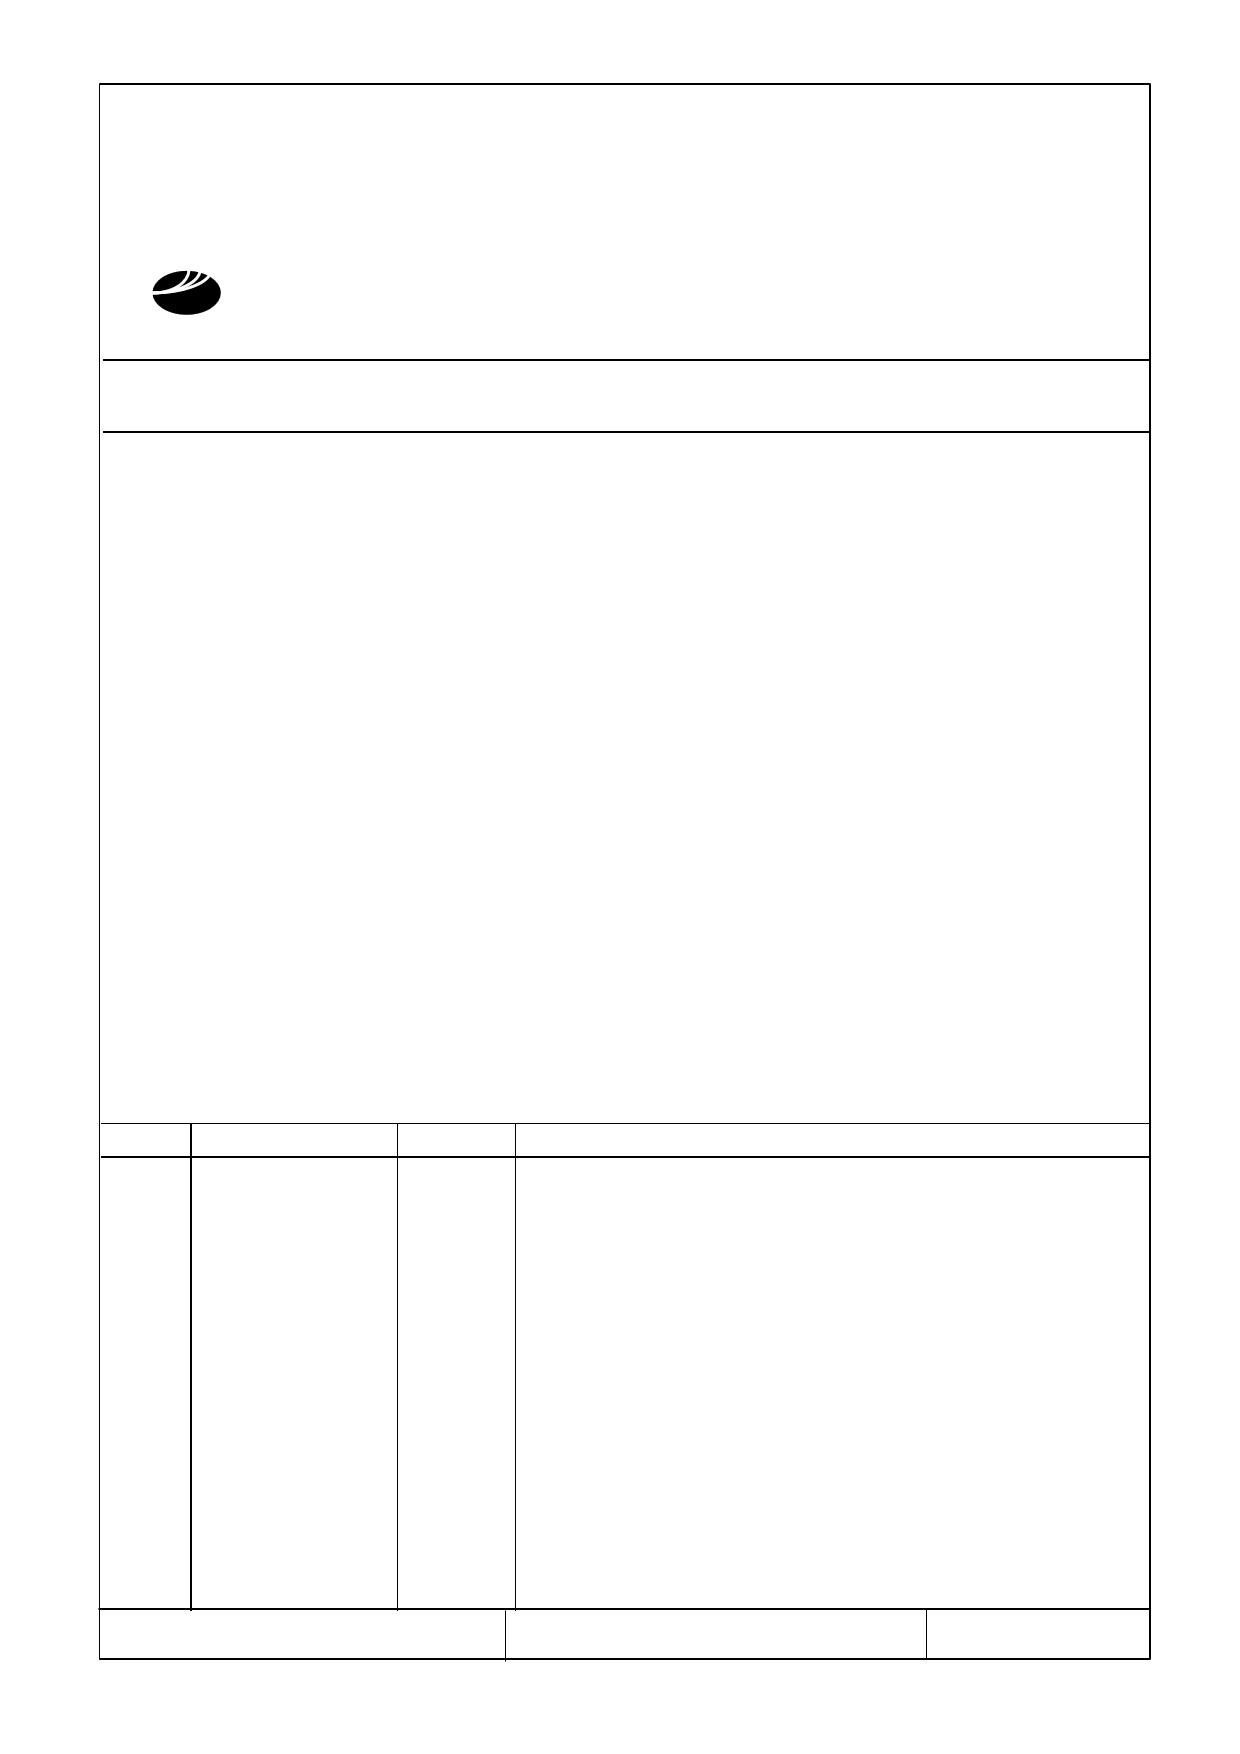 T-51638D084-FW-A-AA دیتاشیت PDF